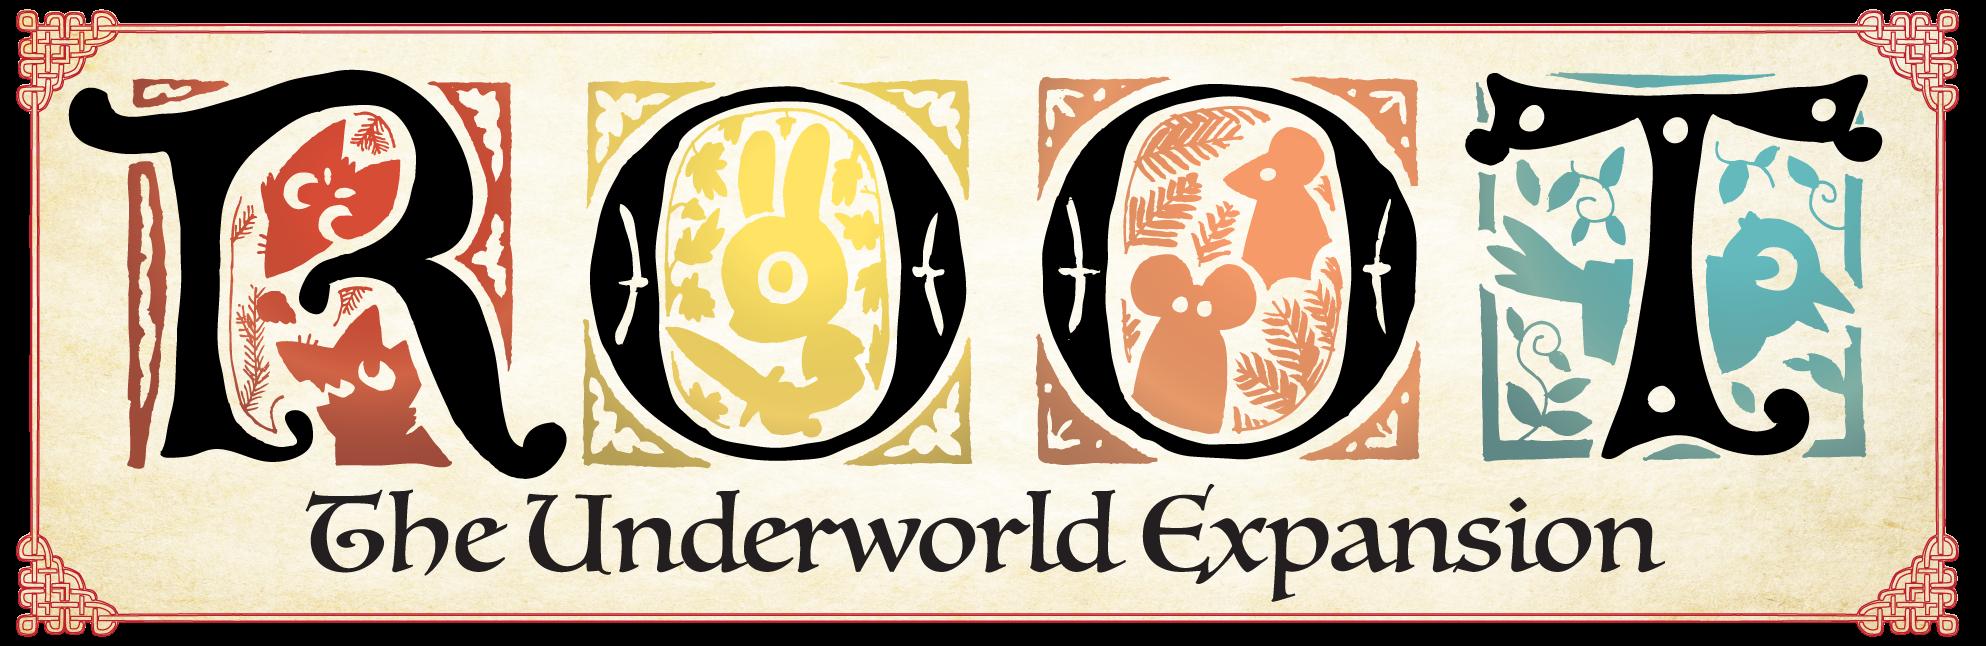 Root: The Underworld Expansion Bundle